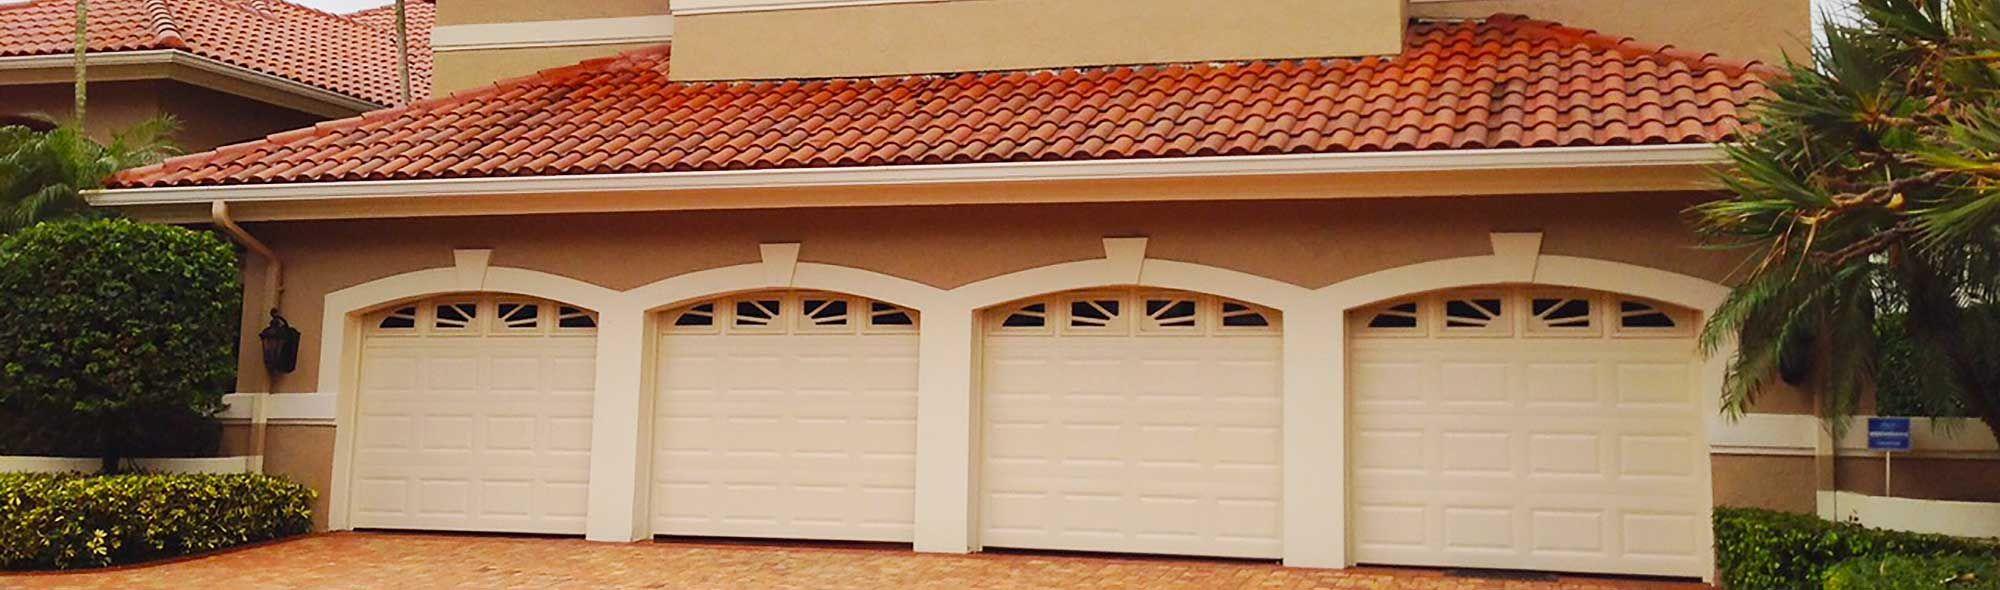 Being Certified By The State Of Florida As A General Contractor Hire Authority Garage Doors Home Improvement Contractors Garage Door Installation Contractors